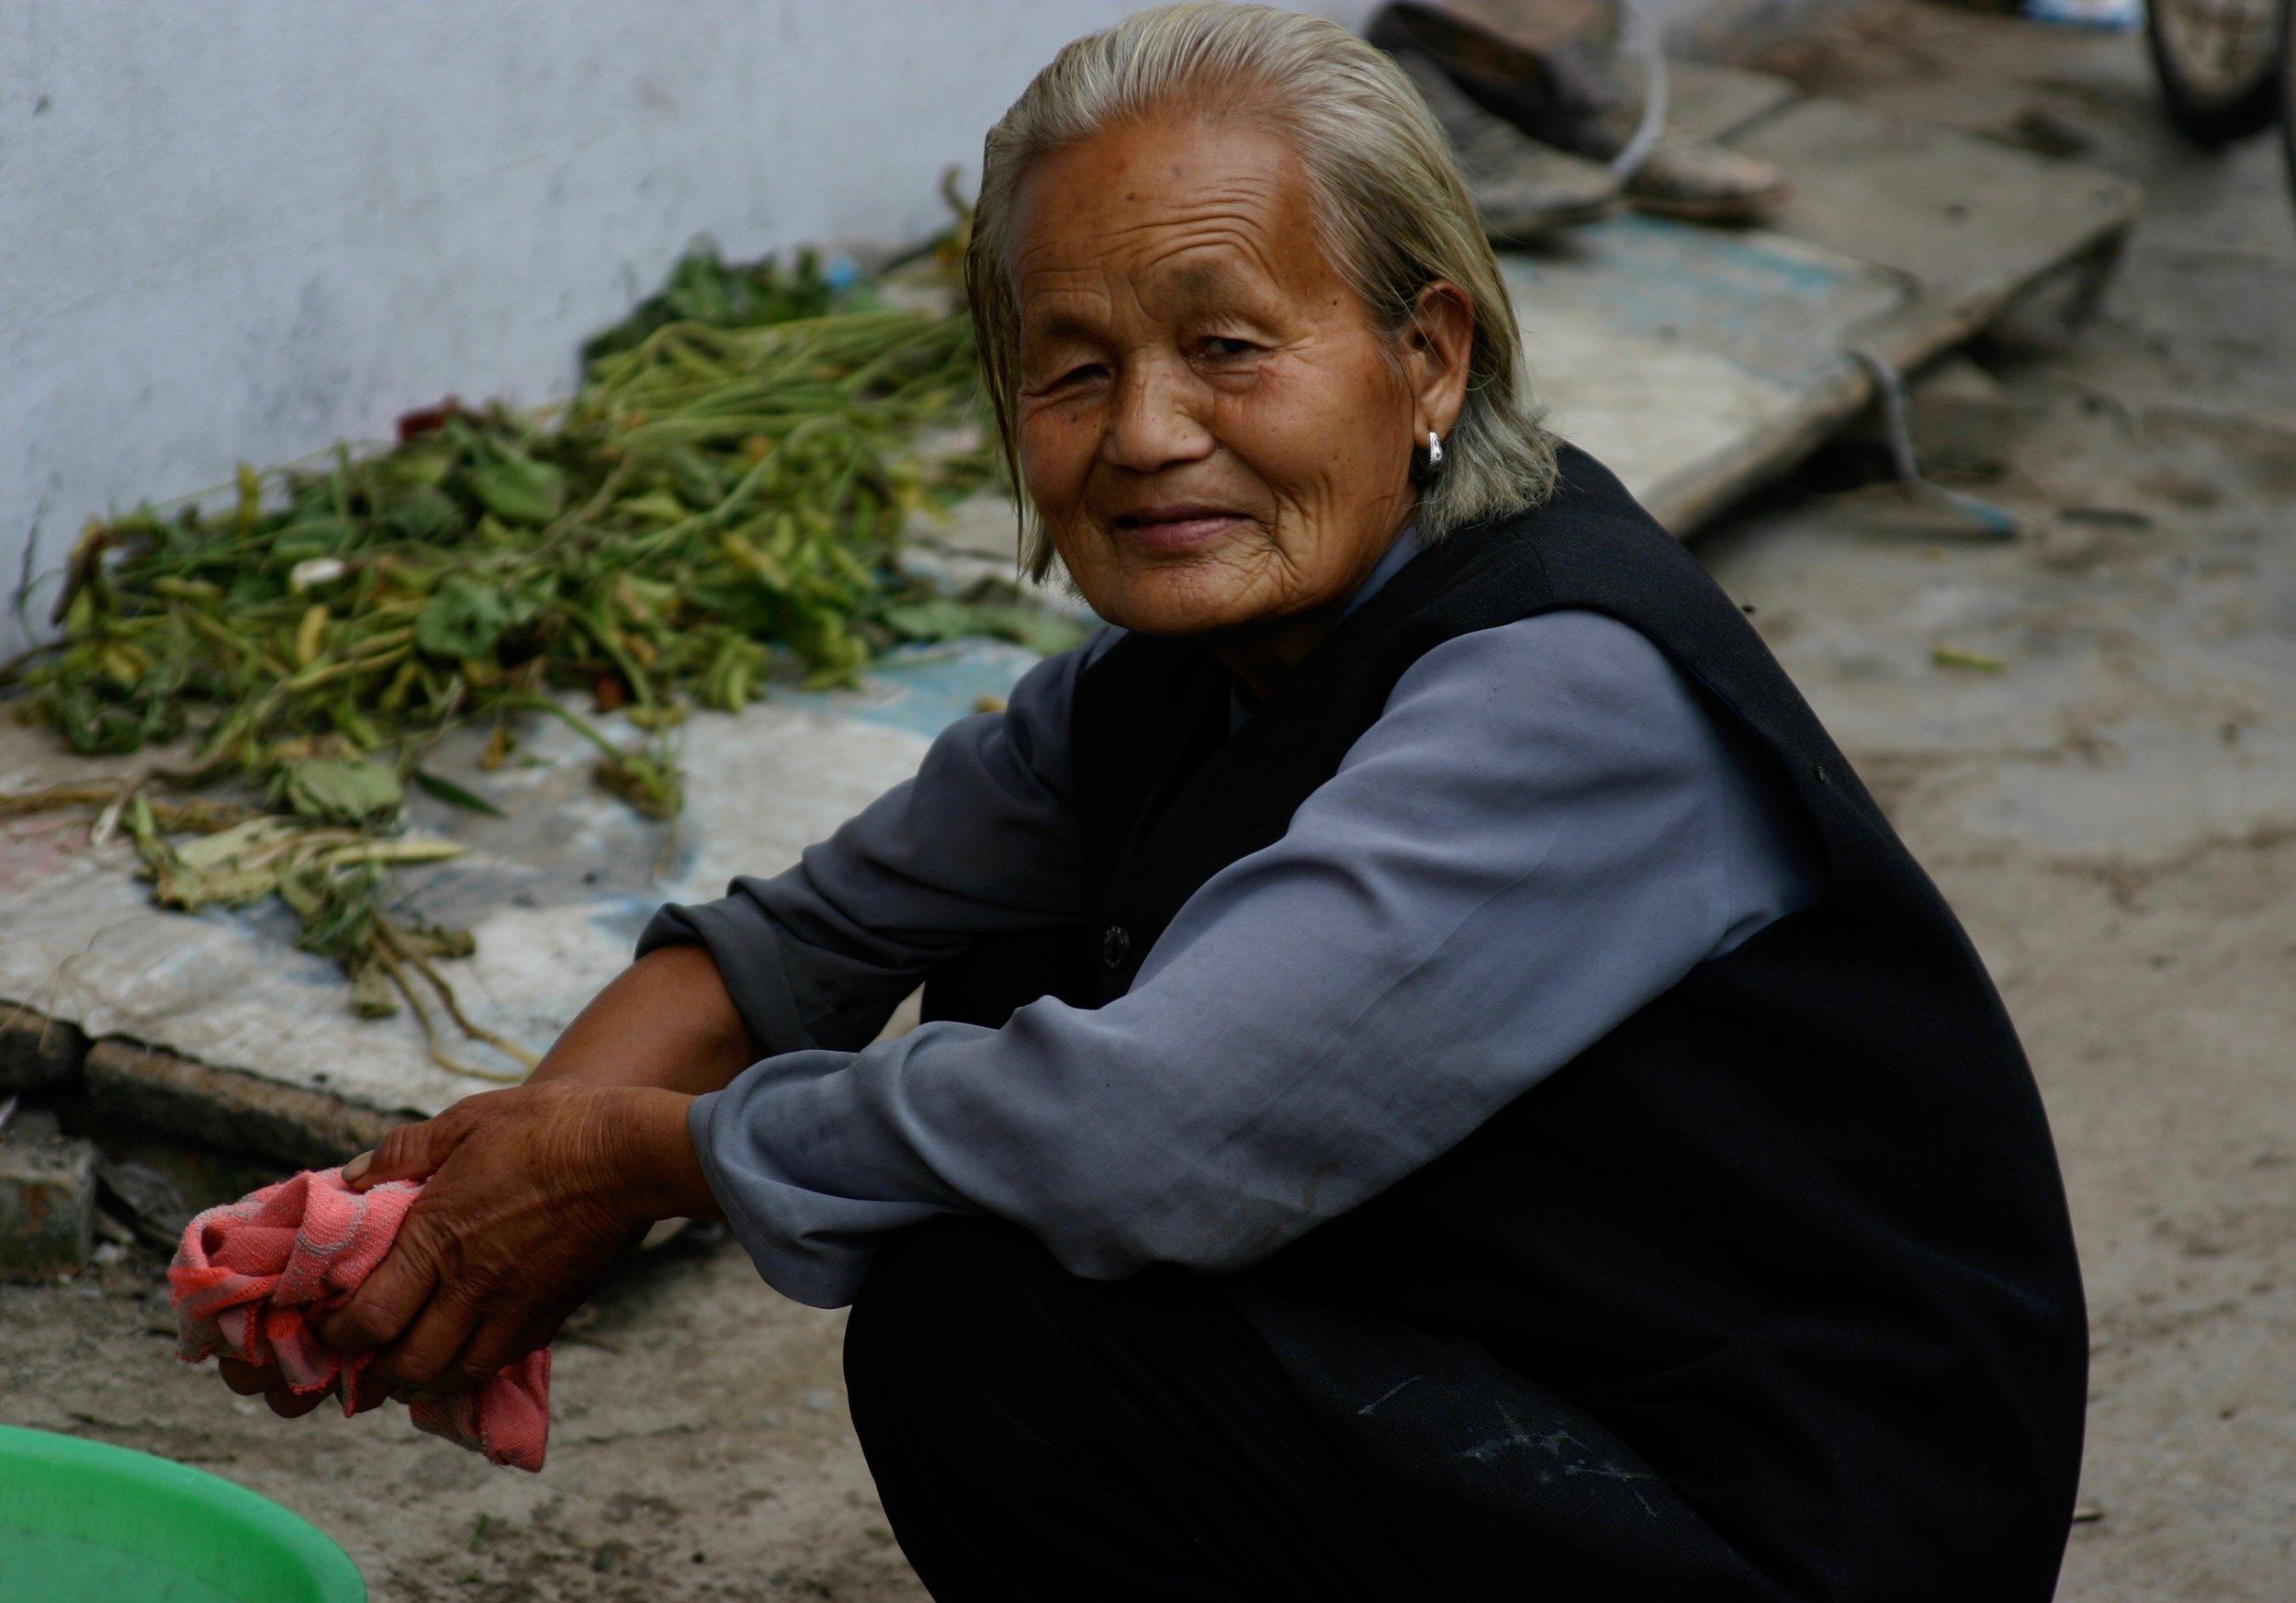 People-China Village Woman.jpg